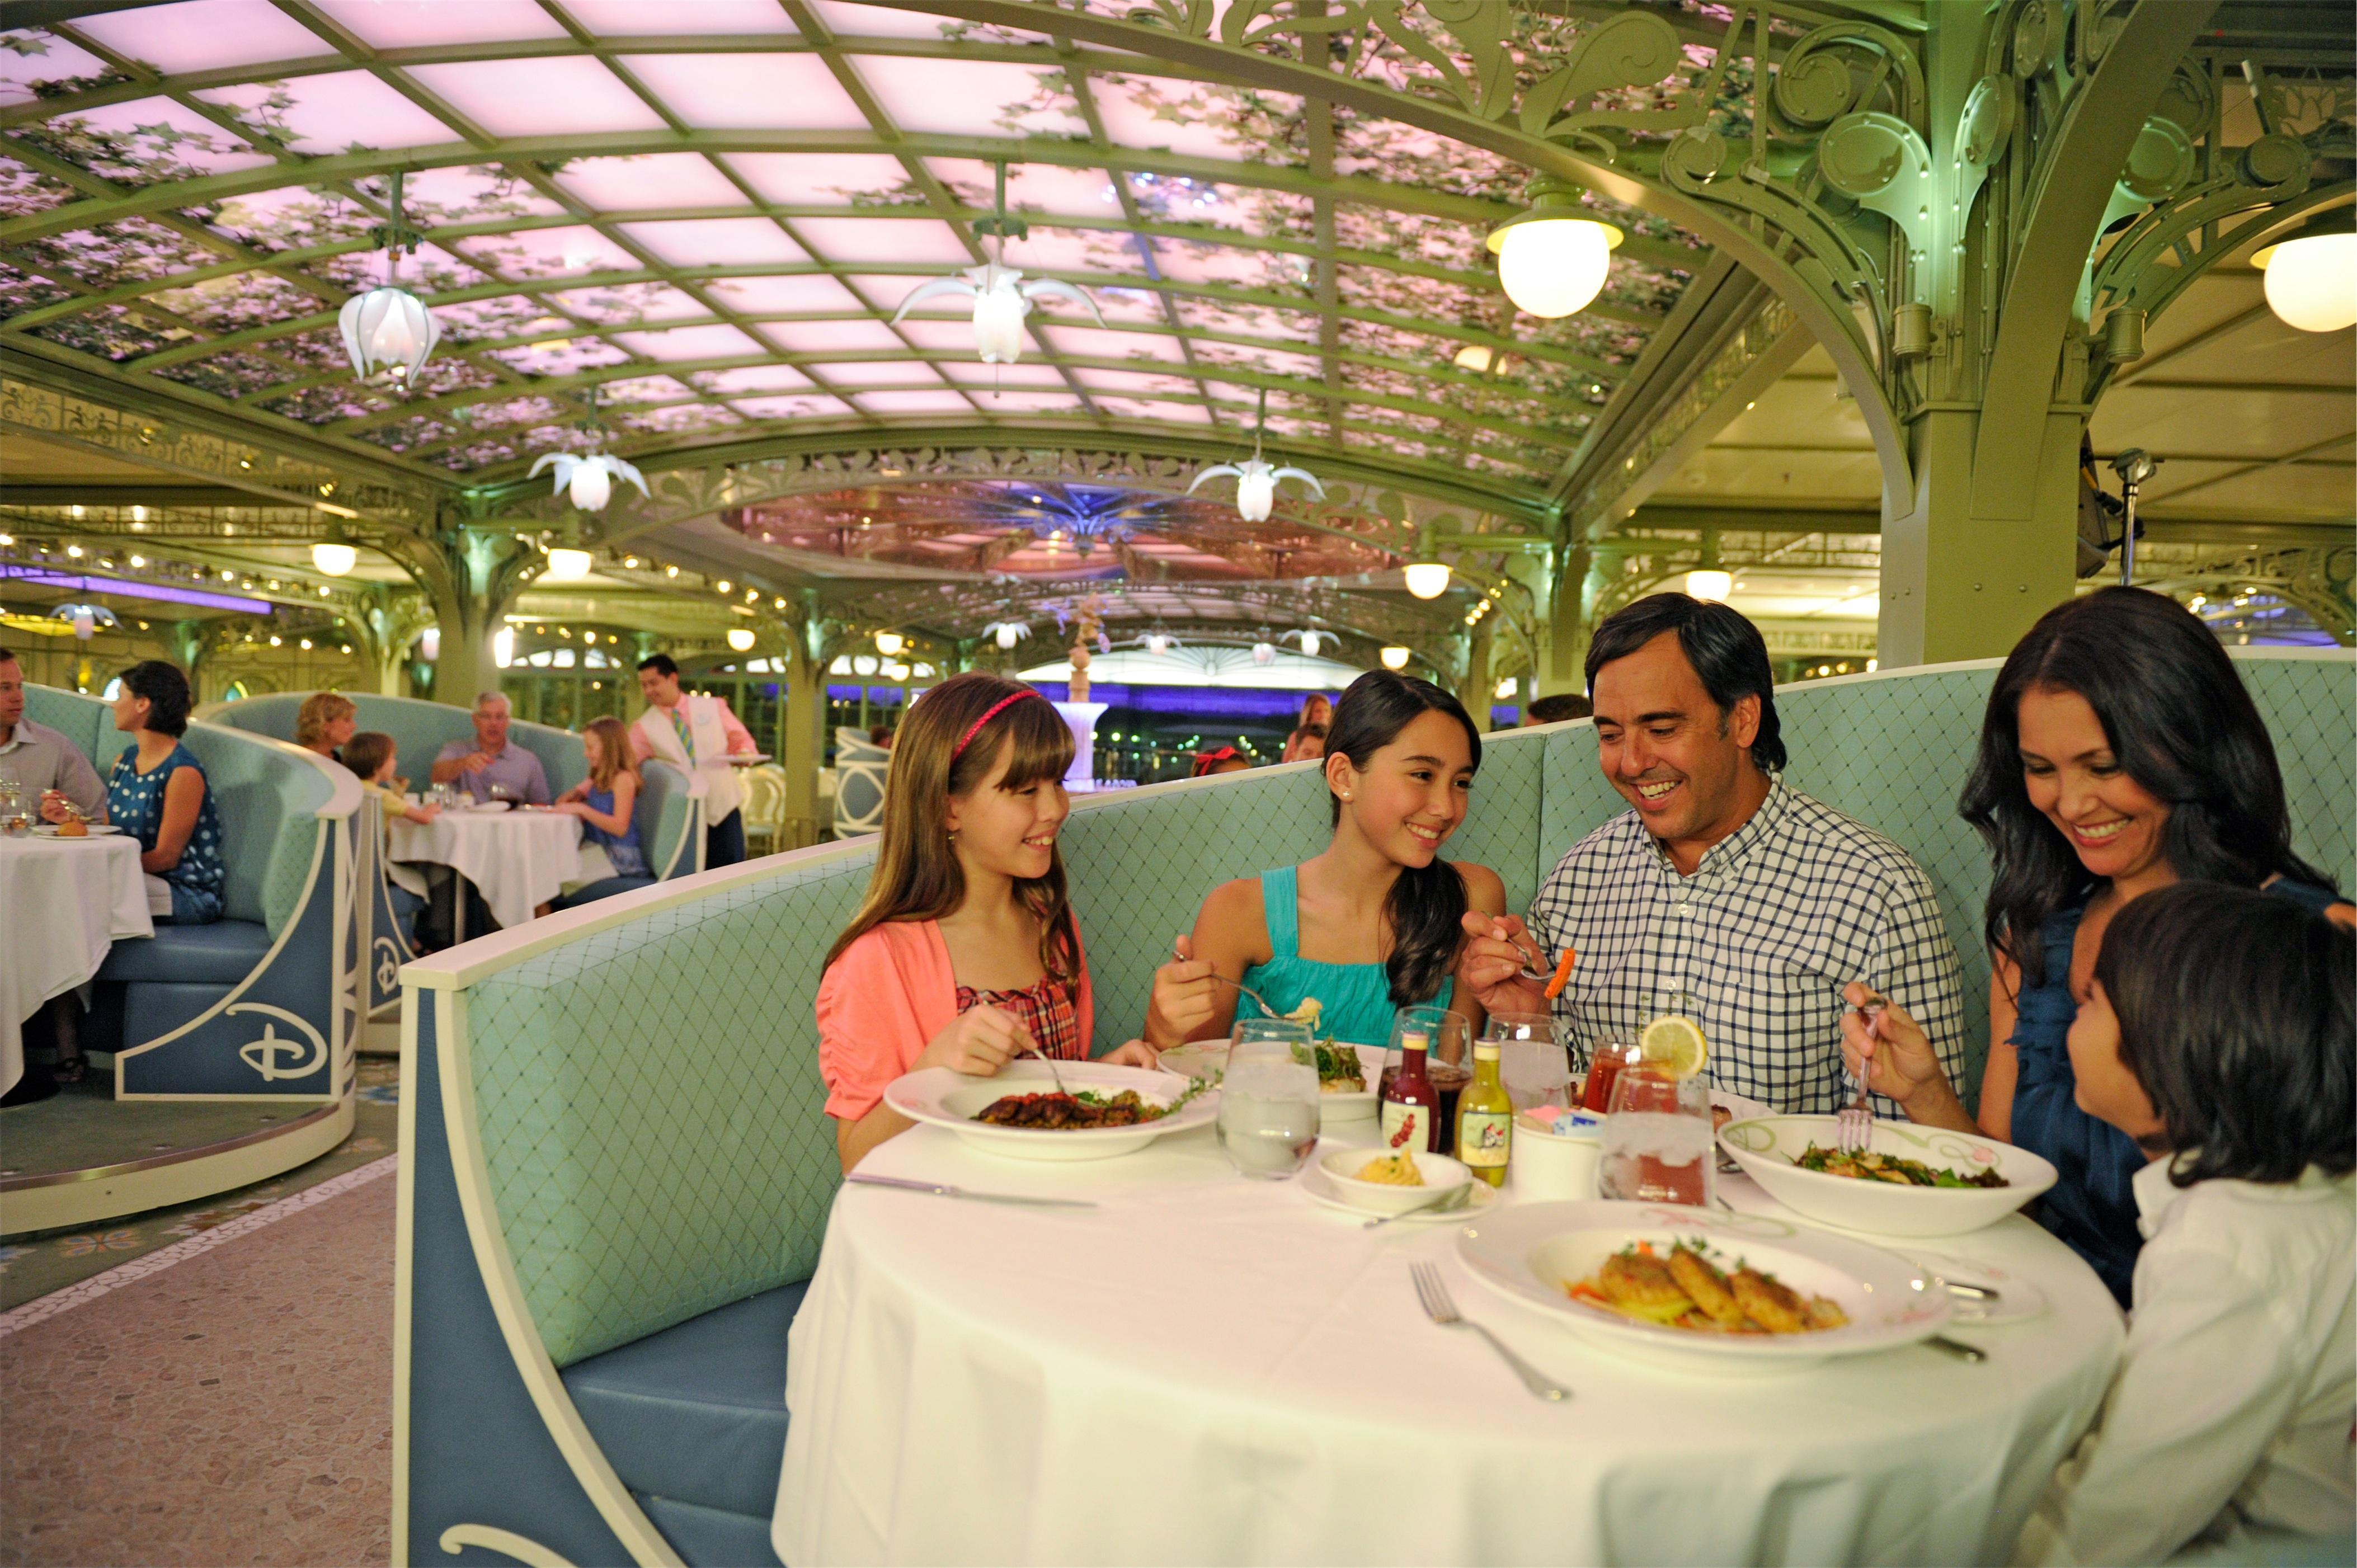 Disney Cruise Line Disney Dream Interior Enchanted Garden Restaurant 1.jpg